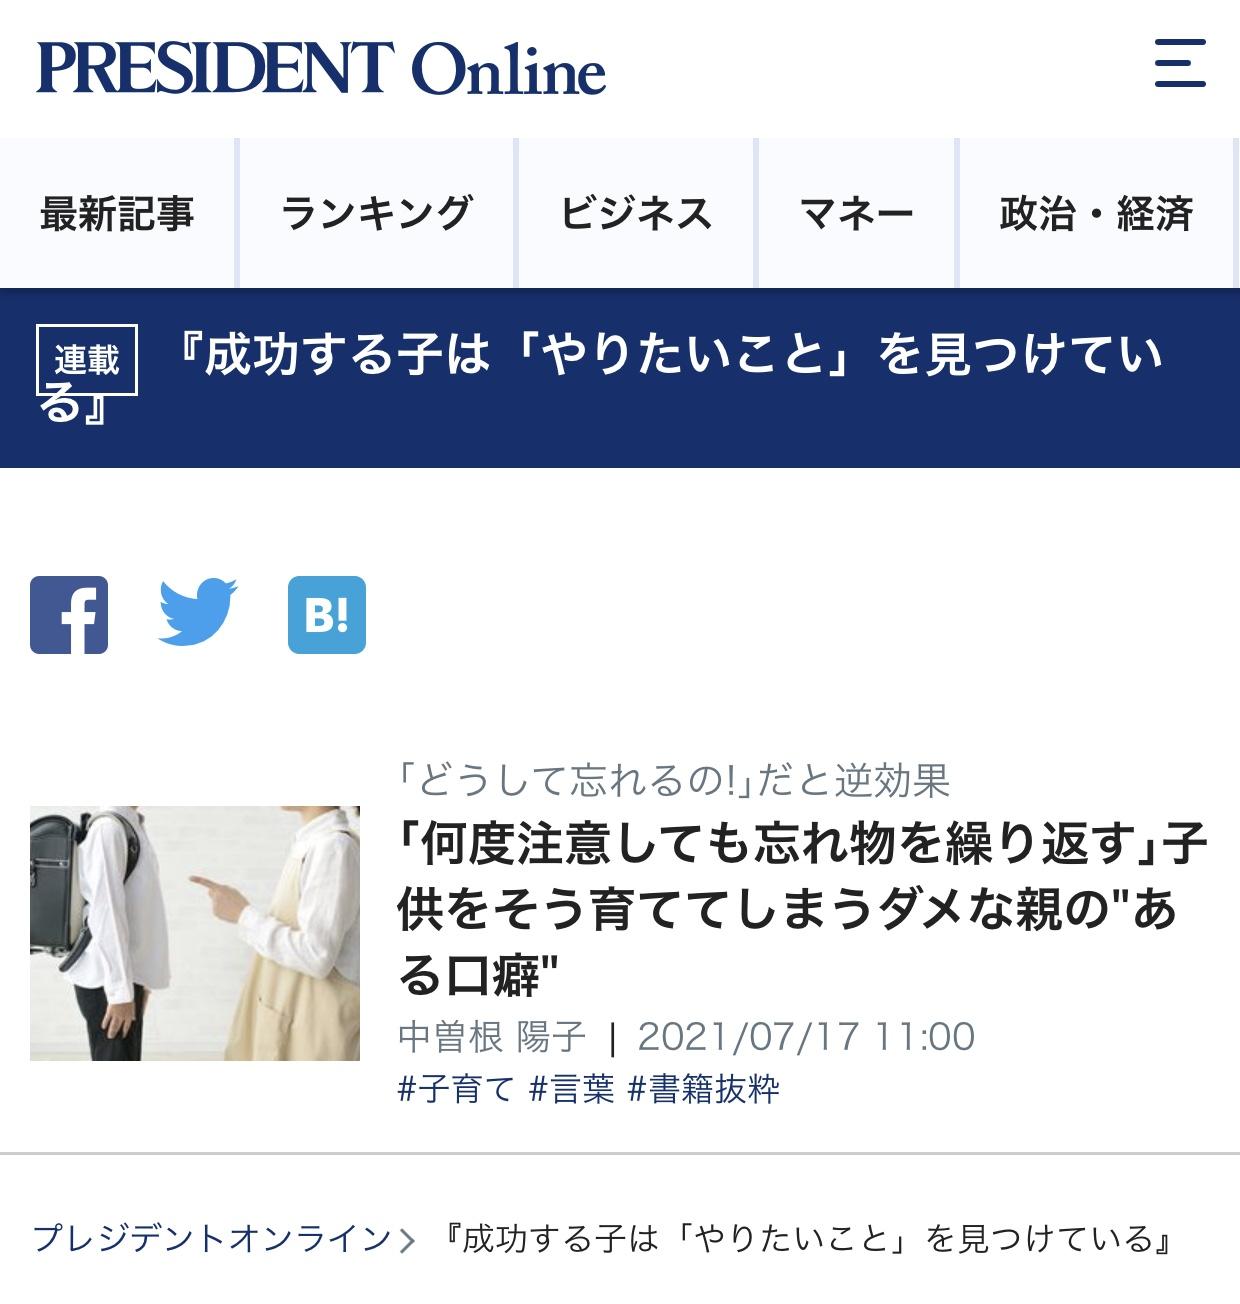 PRESIDENTオンラインで中曽根陽子の新刊が紹介されました